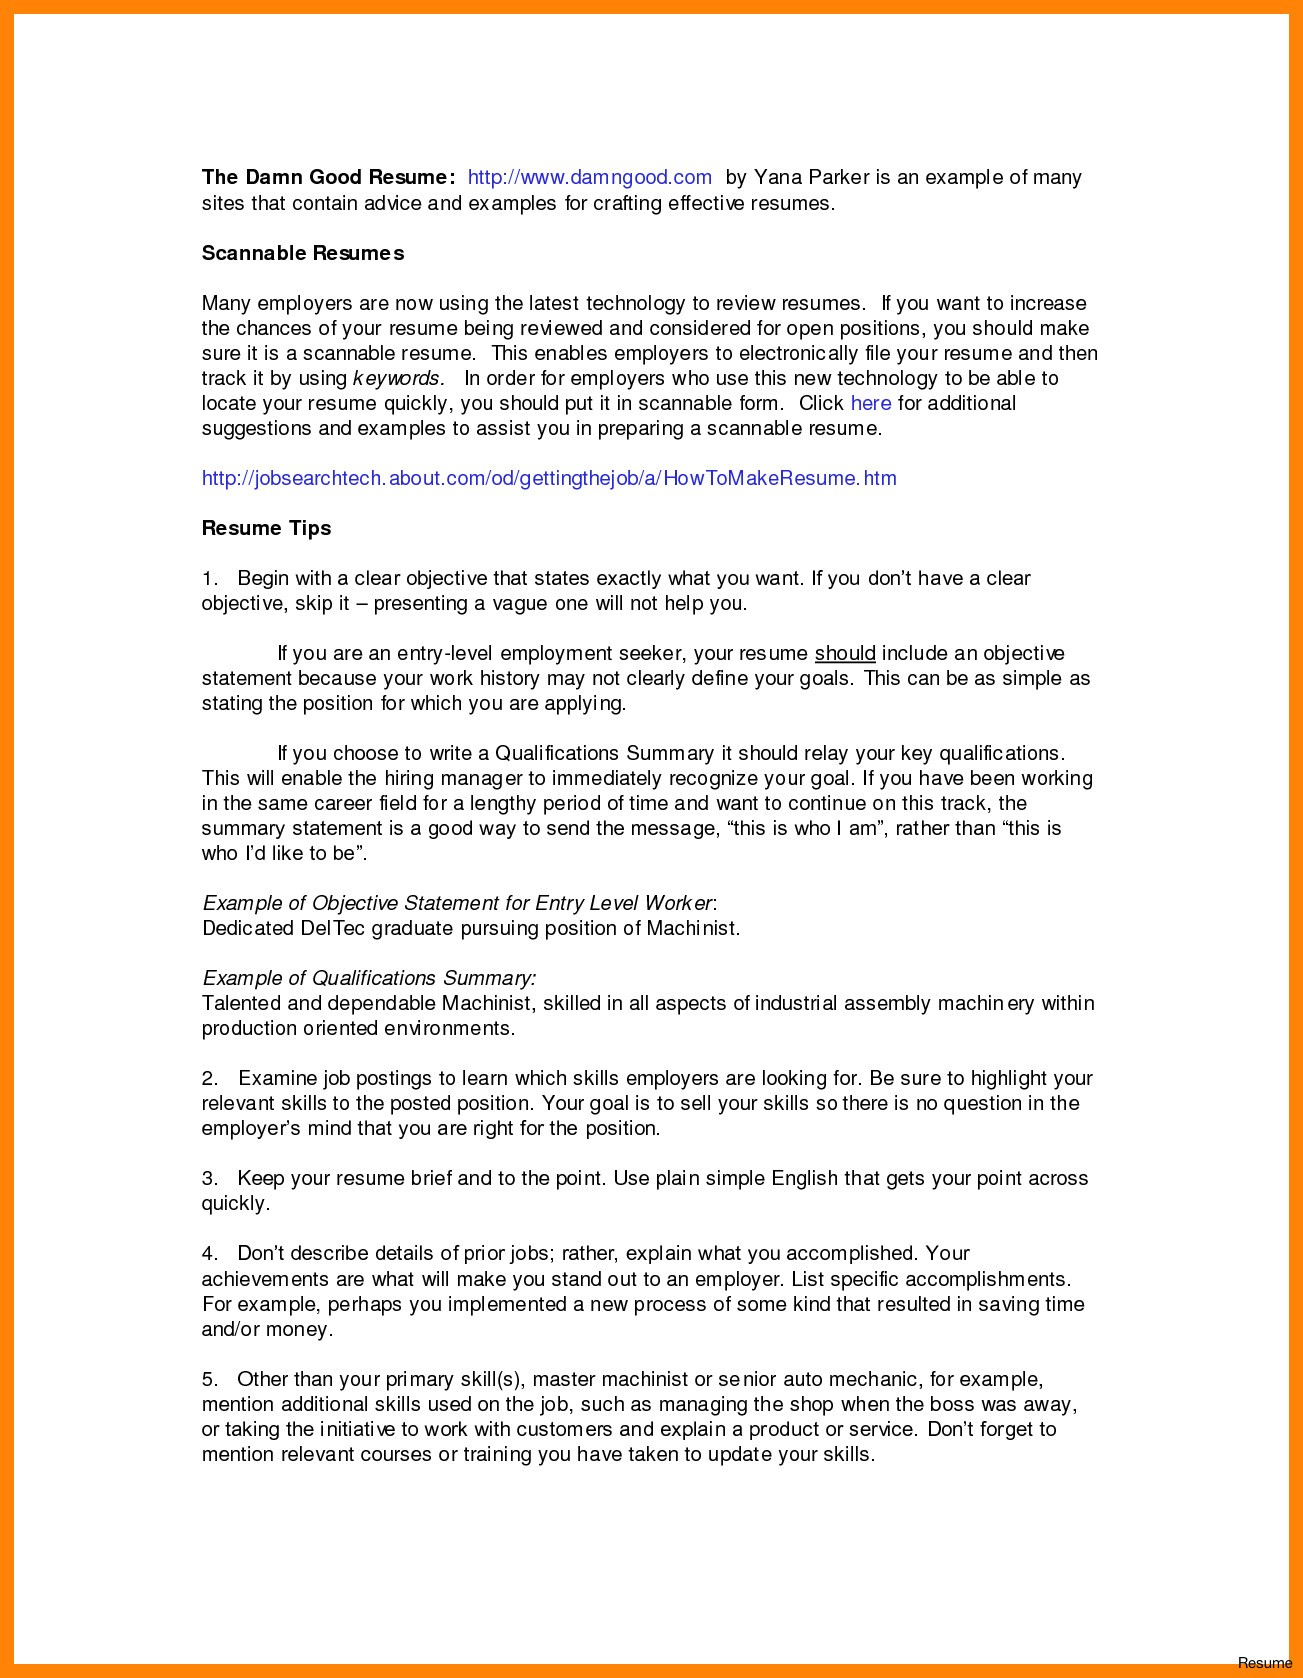 Gift Letter Template for Home Loan - Job Letter for Mortgage New 32 Fresh Sample Gift Letter for Mortgage